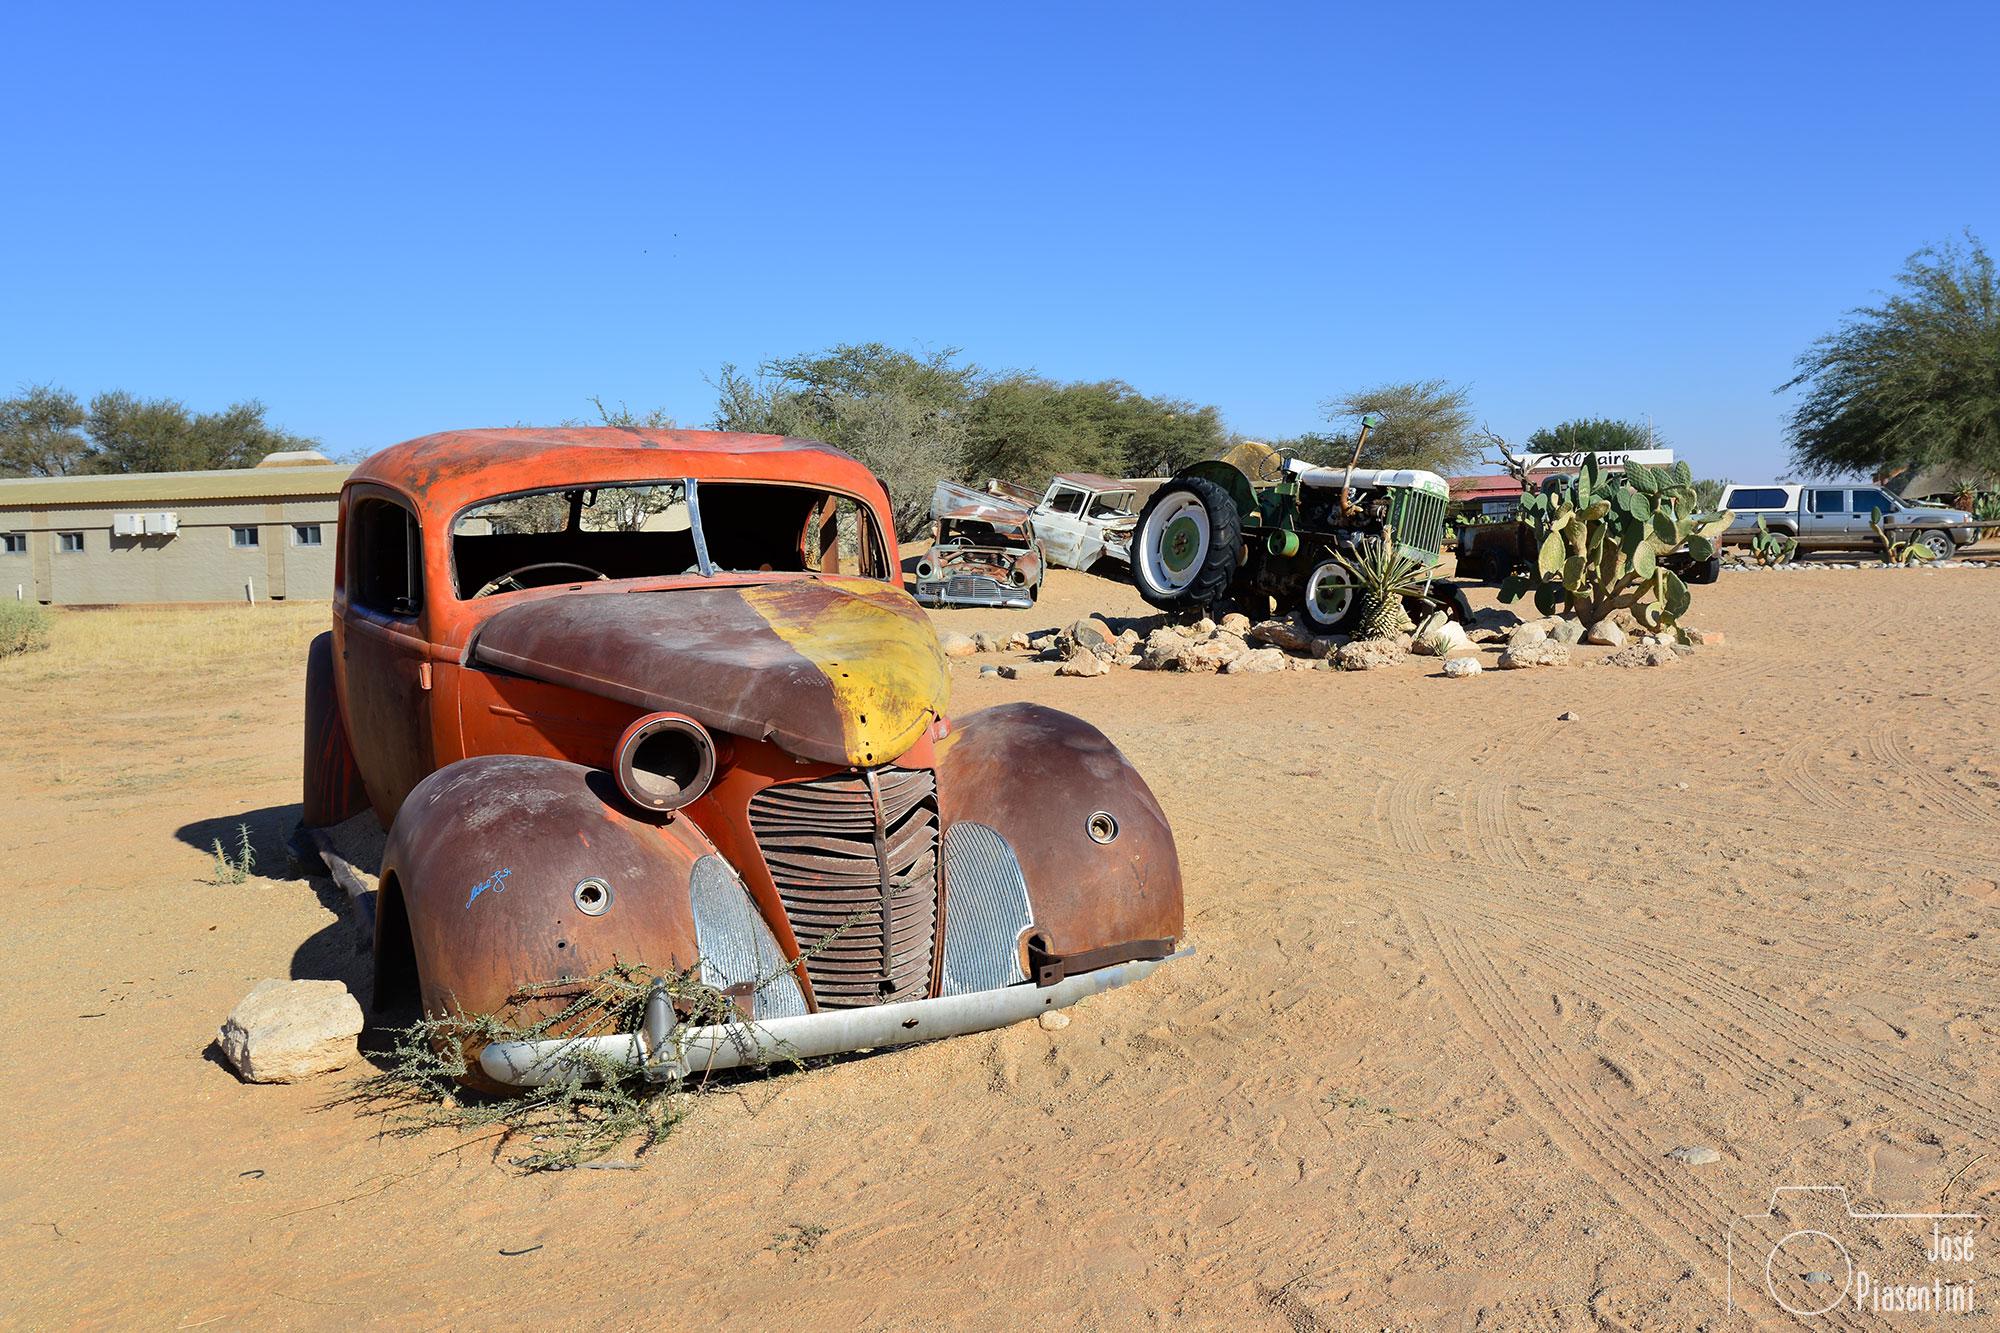 Crash-car-Solitaire-Namibia